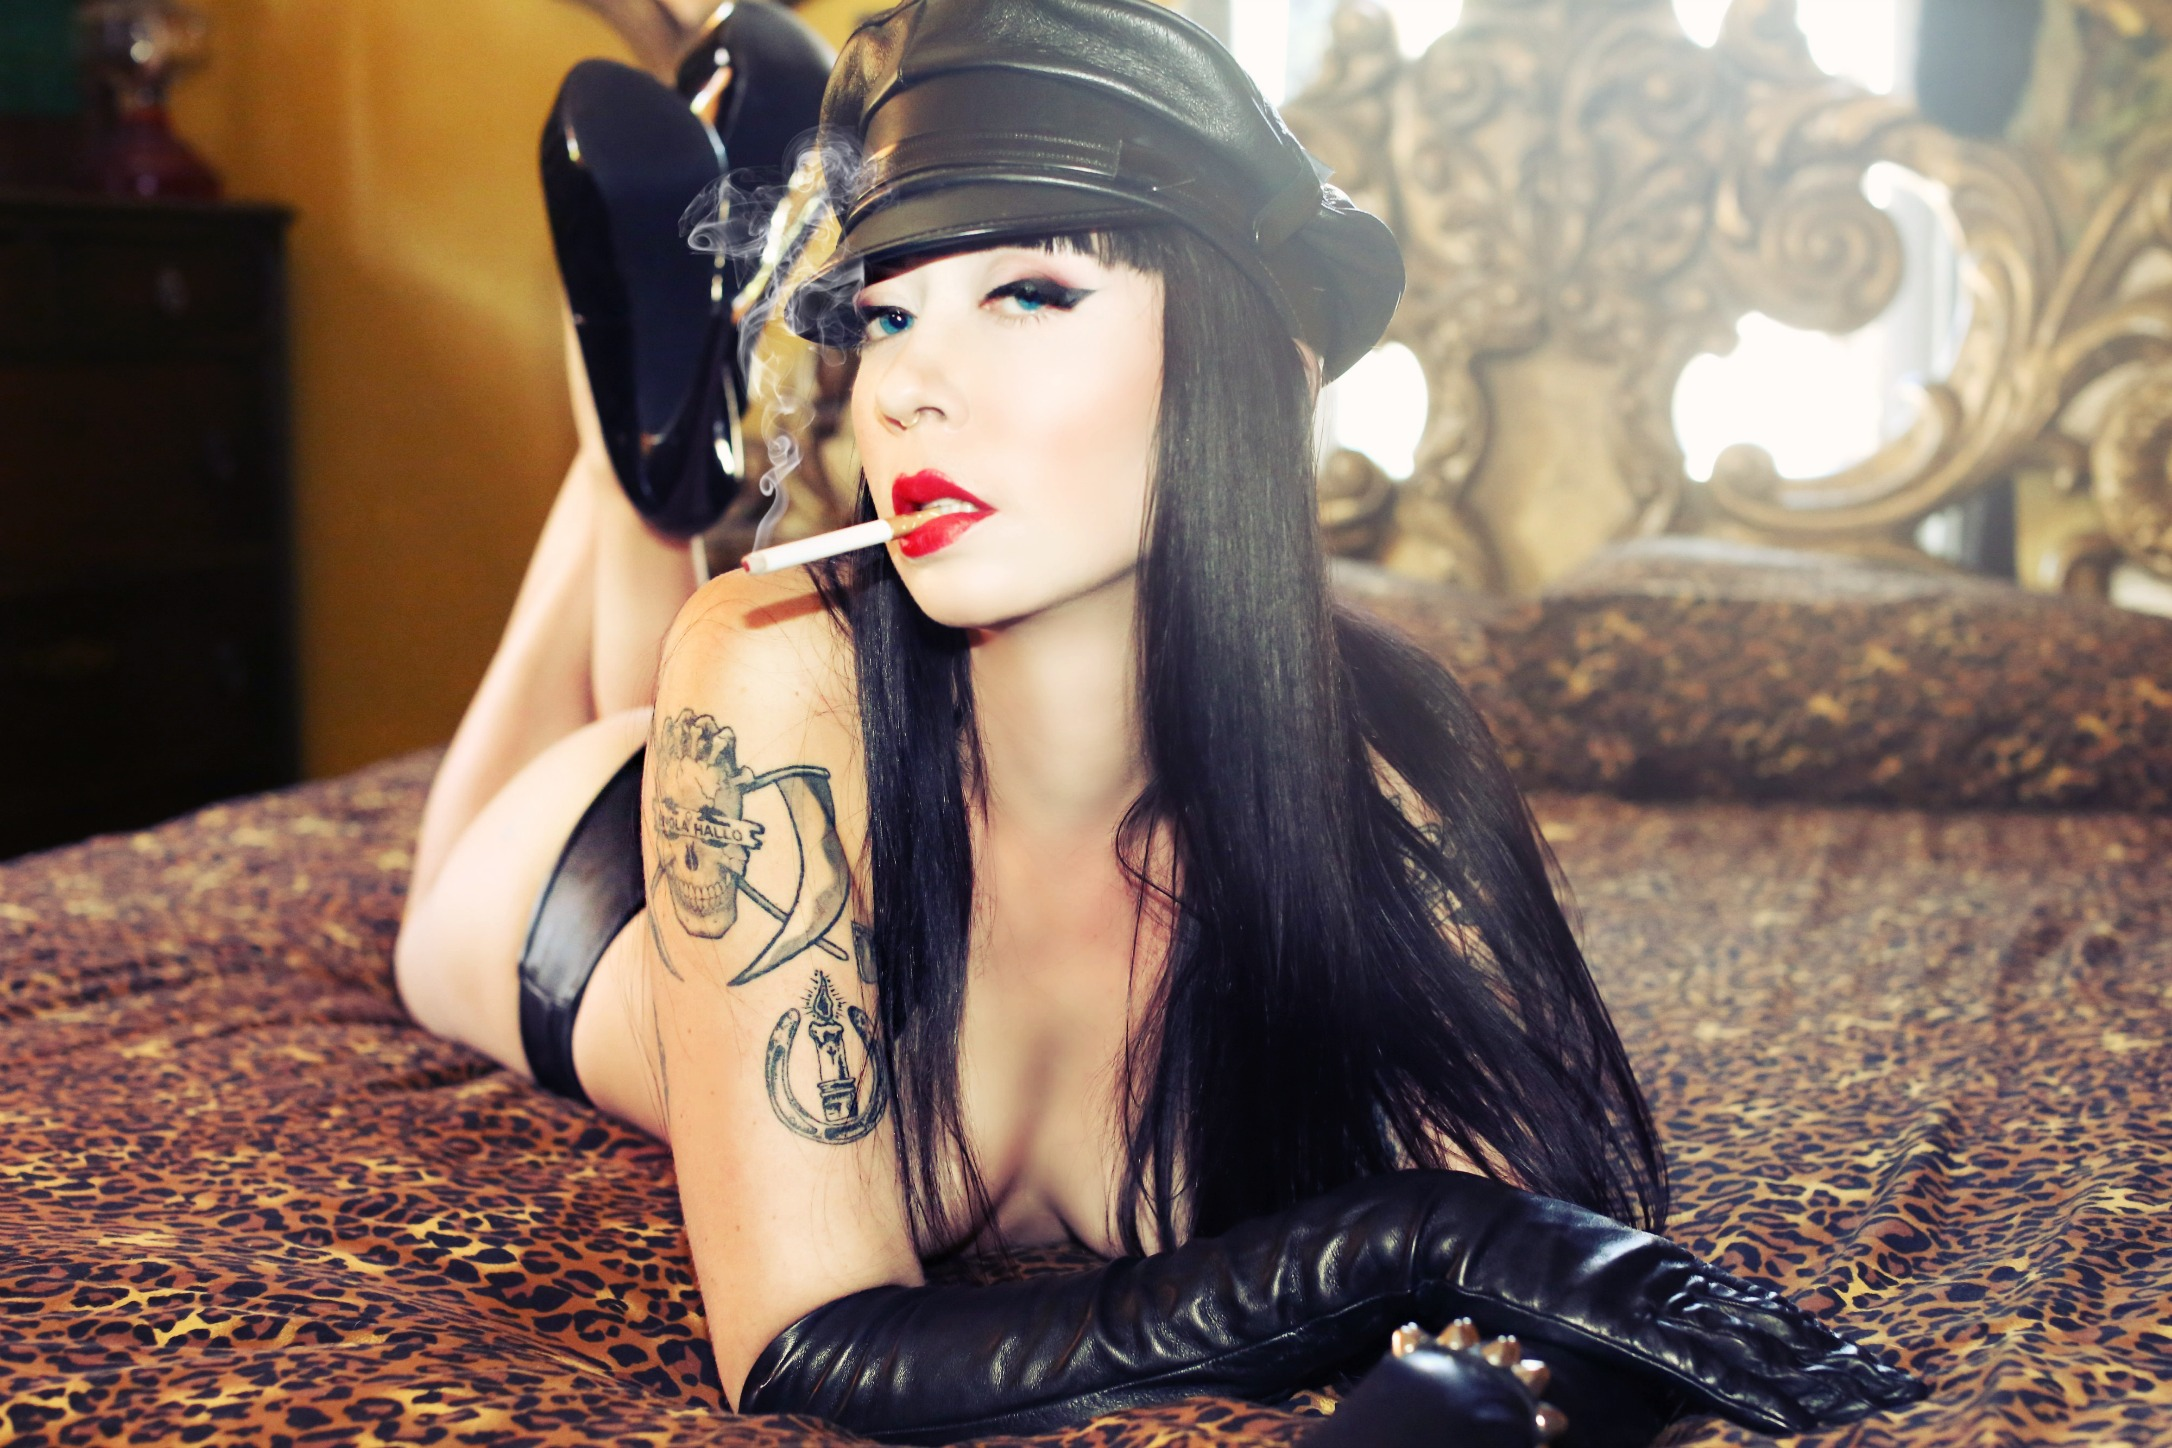 Mistress_Ramona_Ryder_SF_Mistress_Escort_Dominatrix_leather_cigarette_smoking.jpg